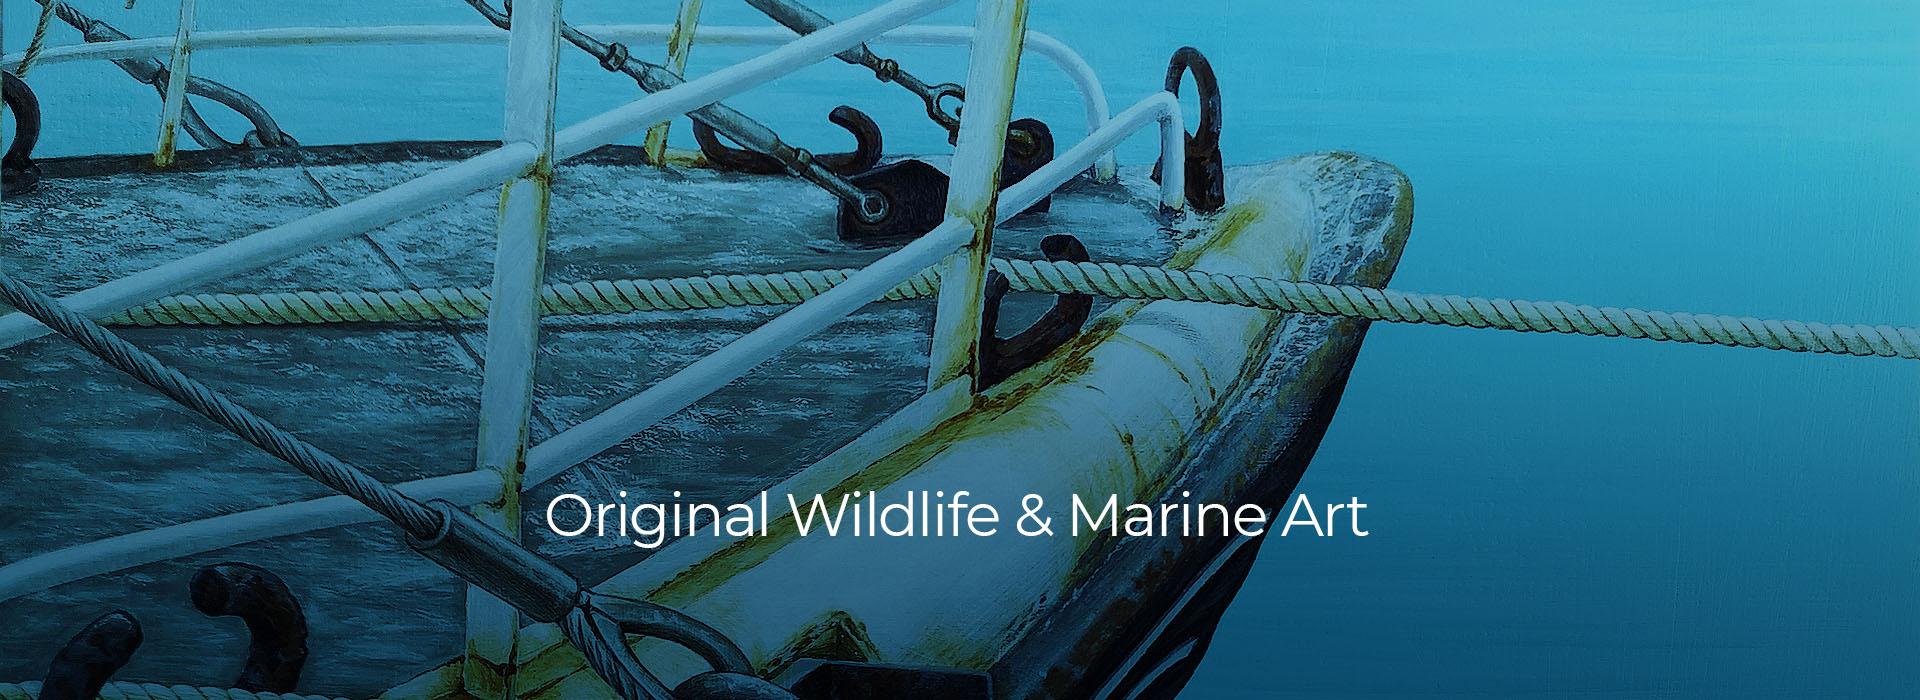 Original wildlife art & marine paintings for sale